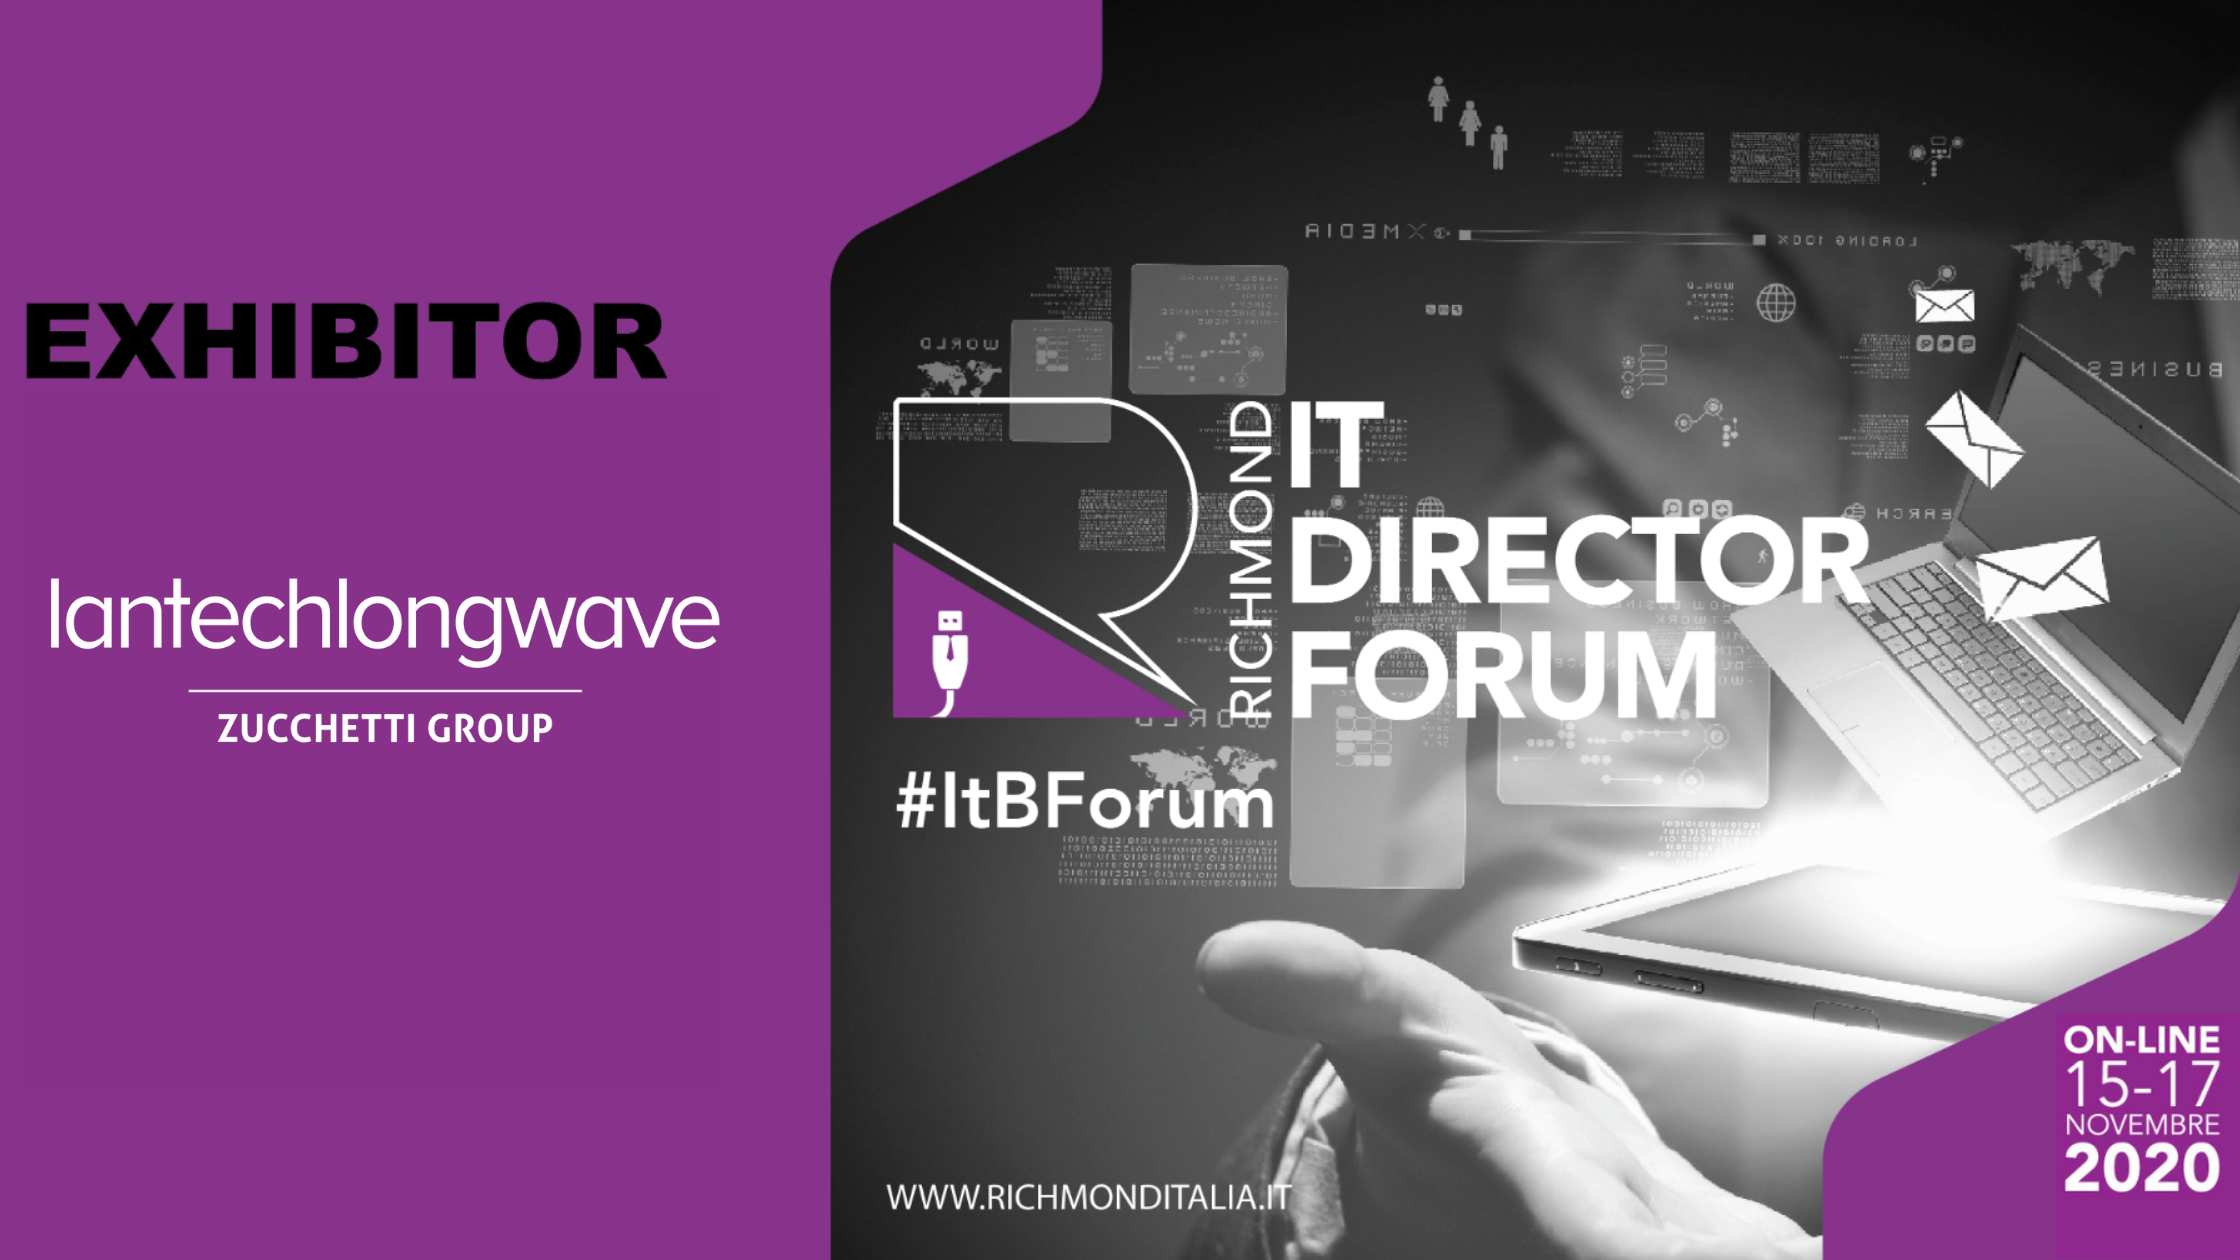 Richmond IT Director Forum Online 15 - 17 Novembre, 2020